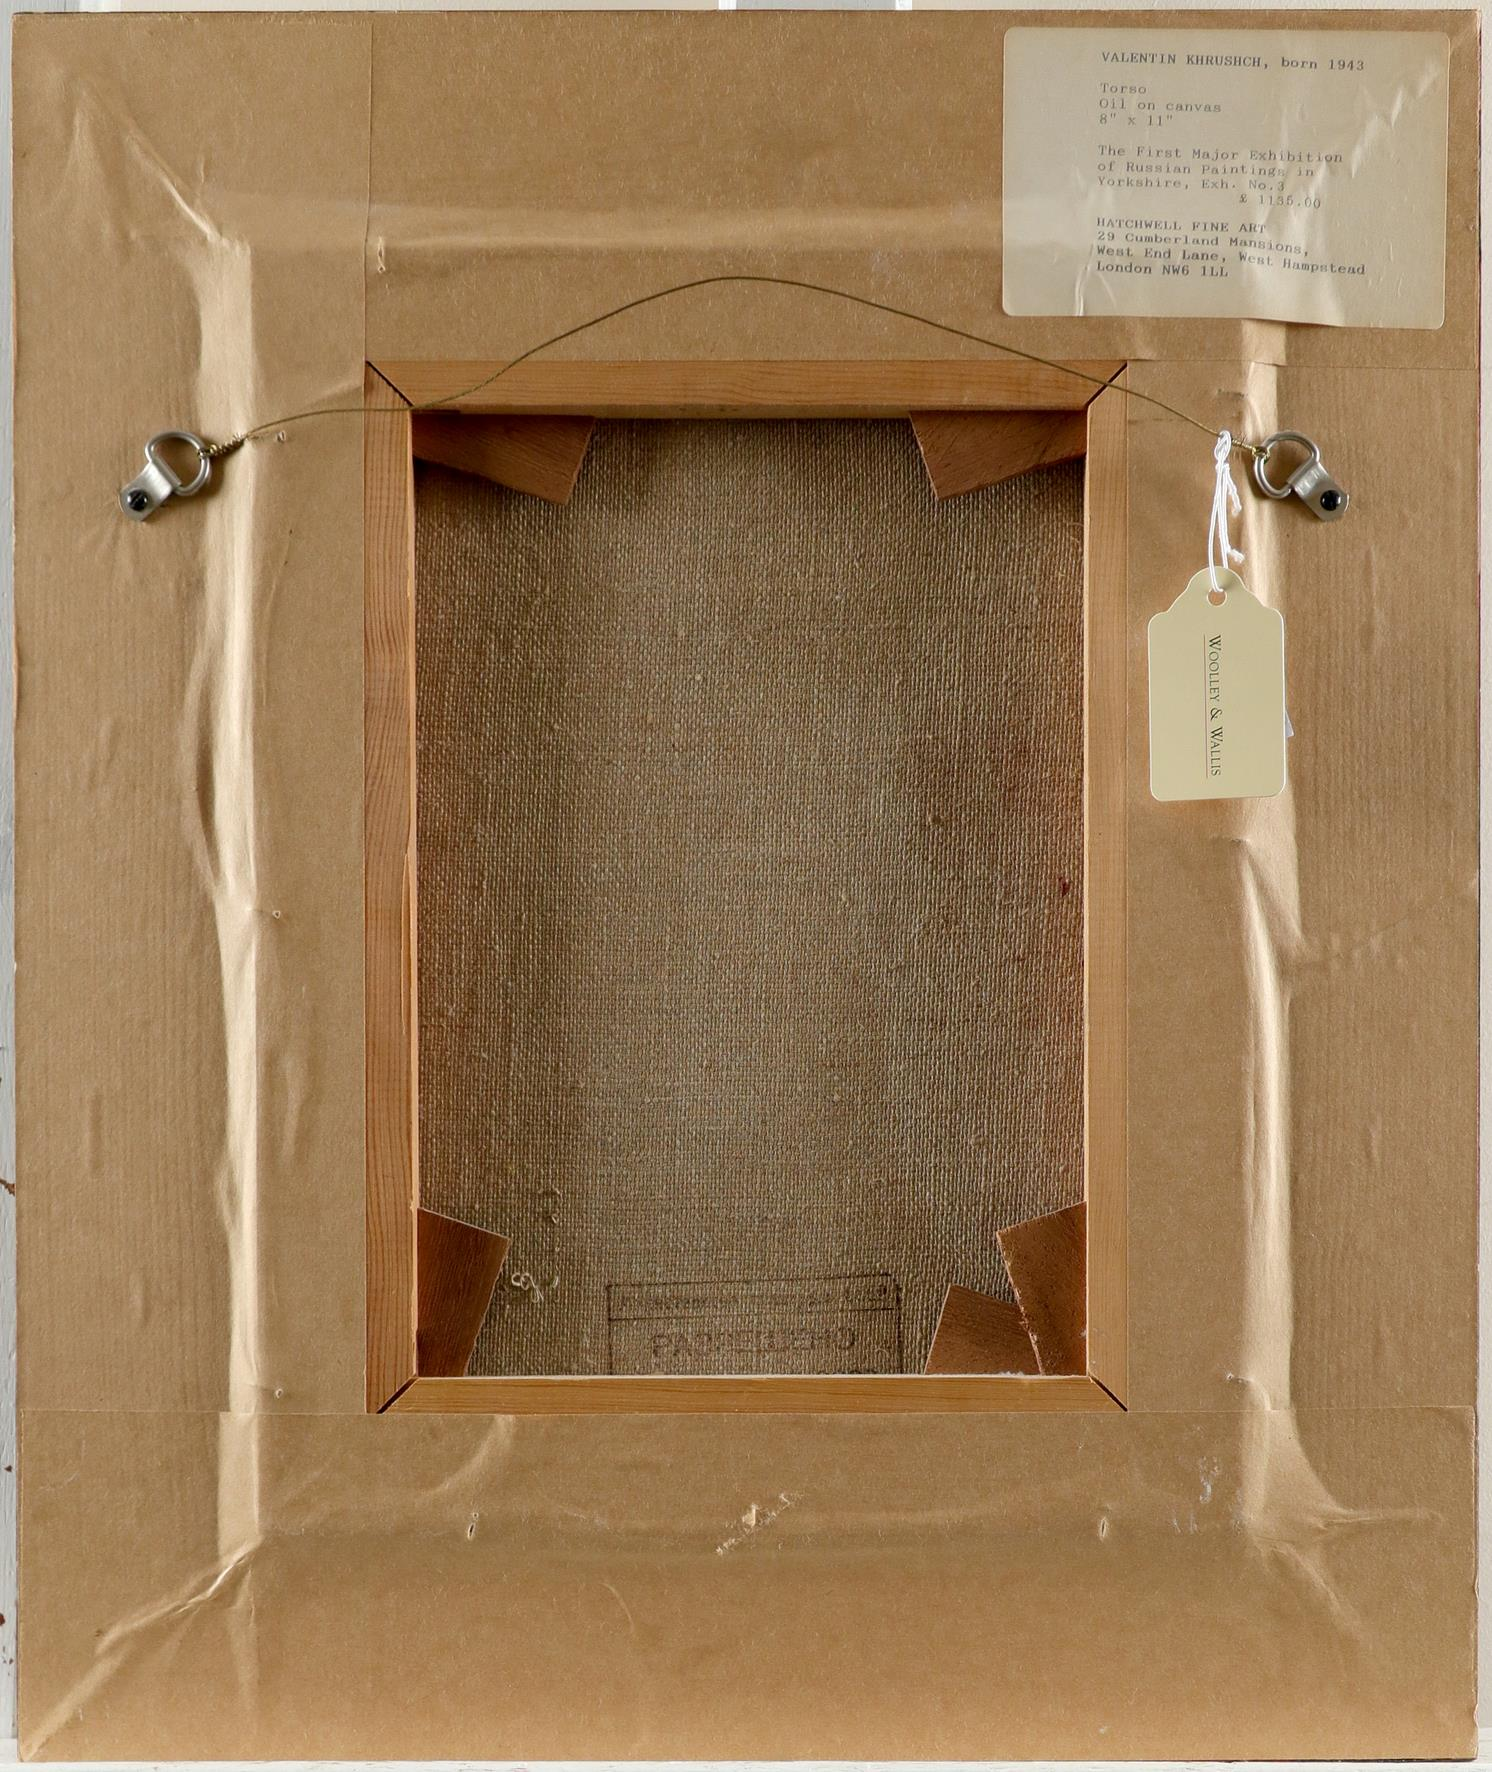 Valentin Khrushch (Ukrainian 1943-2005) Torso Oil on canvas 33.5 x 24.8cm Provenance: Hatchwell Fine - Image 3 of 3